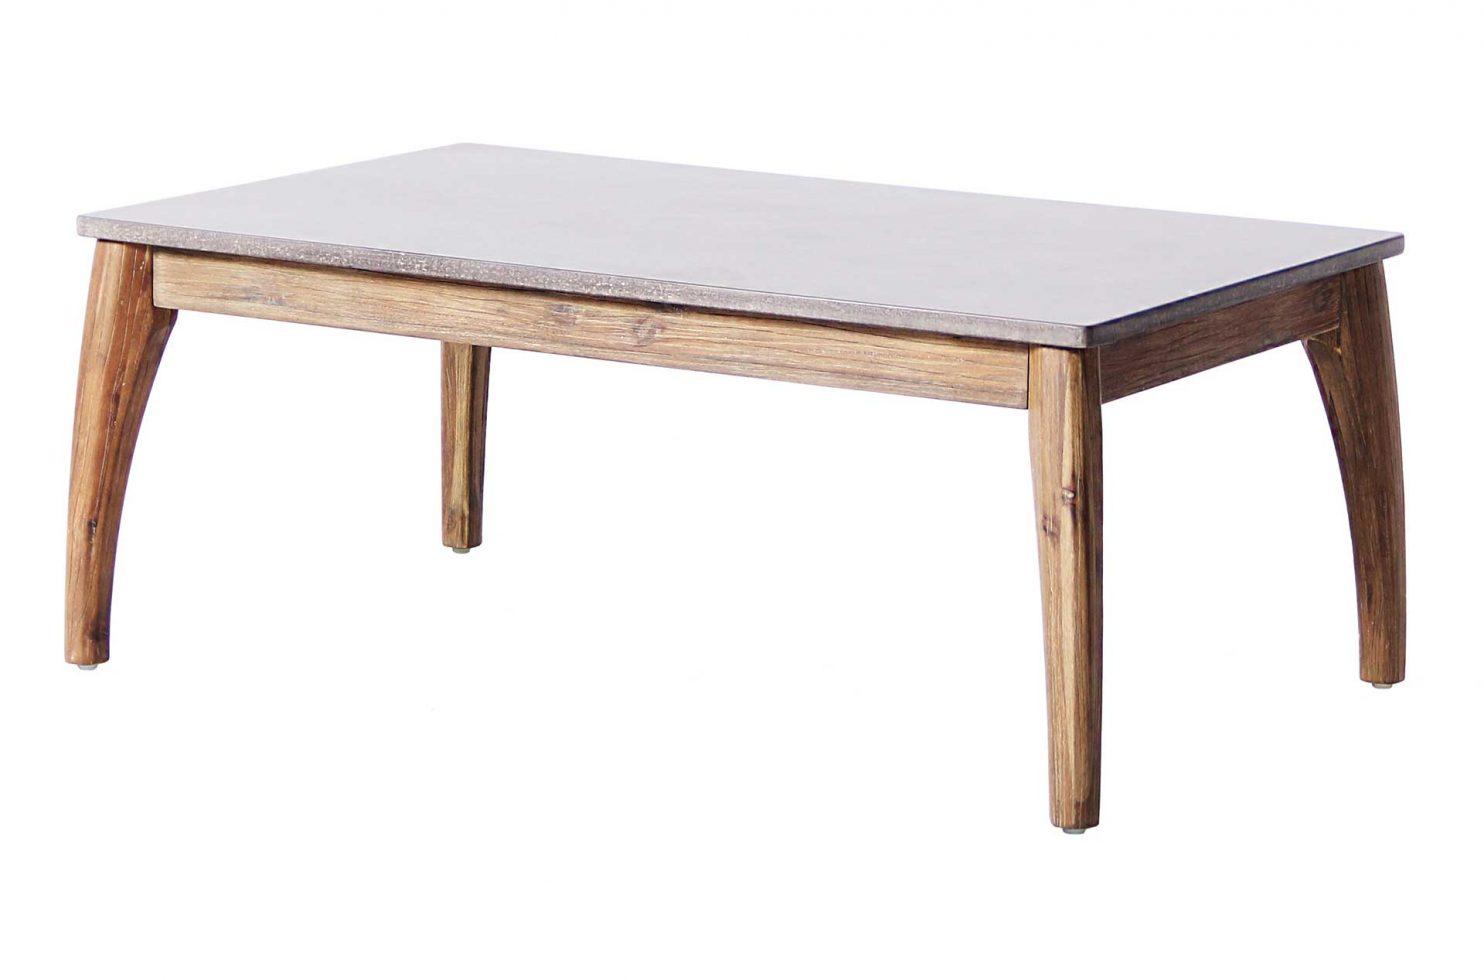 wings coffee table E50499003 1 3Q web